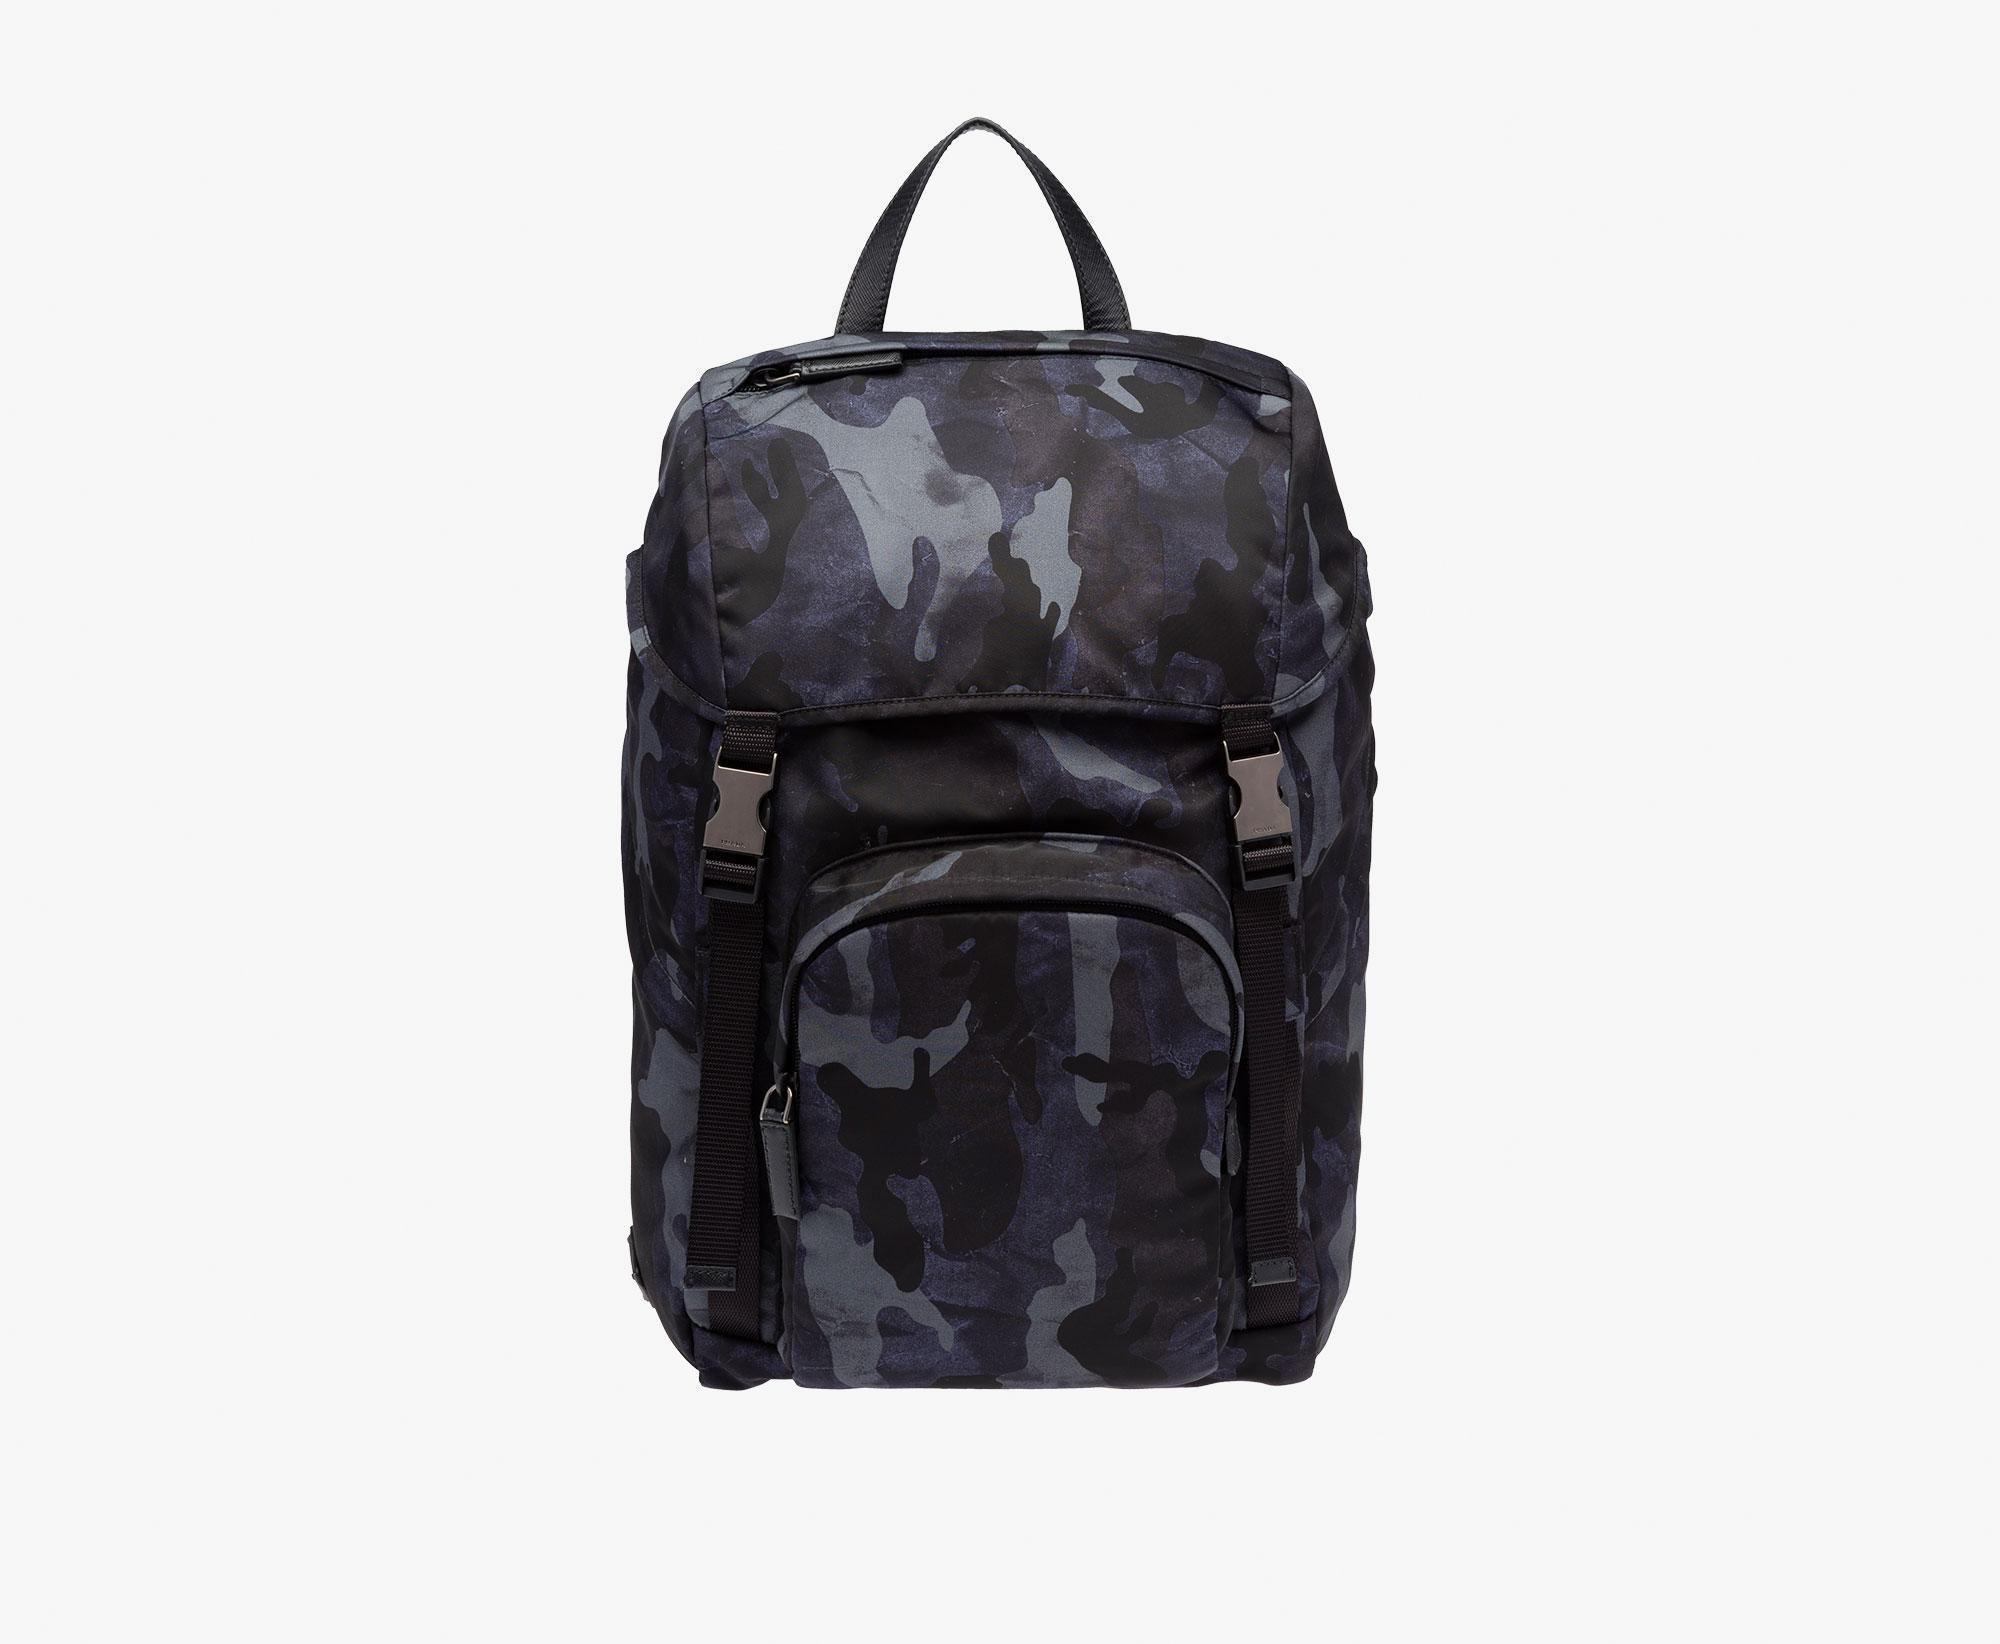 de40143d74197 ... low cost lyst prada fabric backpack in blue for men 80d6e 3a057